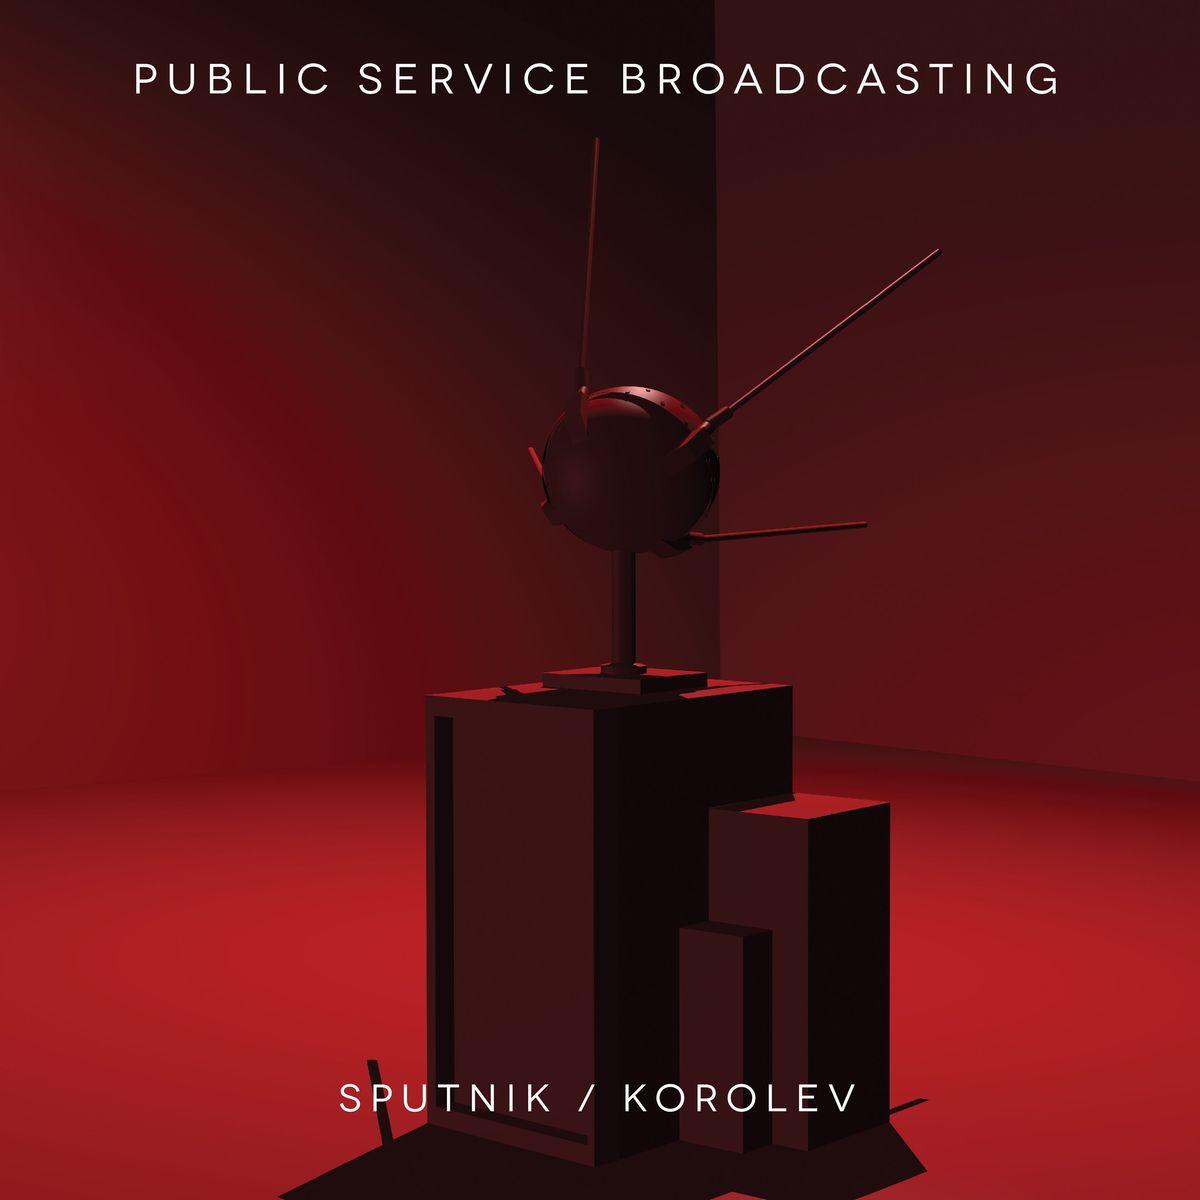 Public Service Broadcasting - Sputnik/Korolev EP